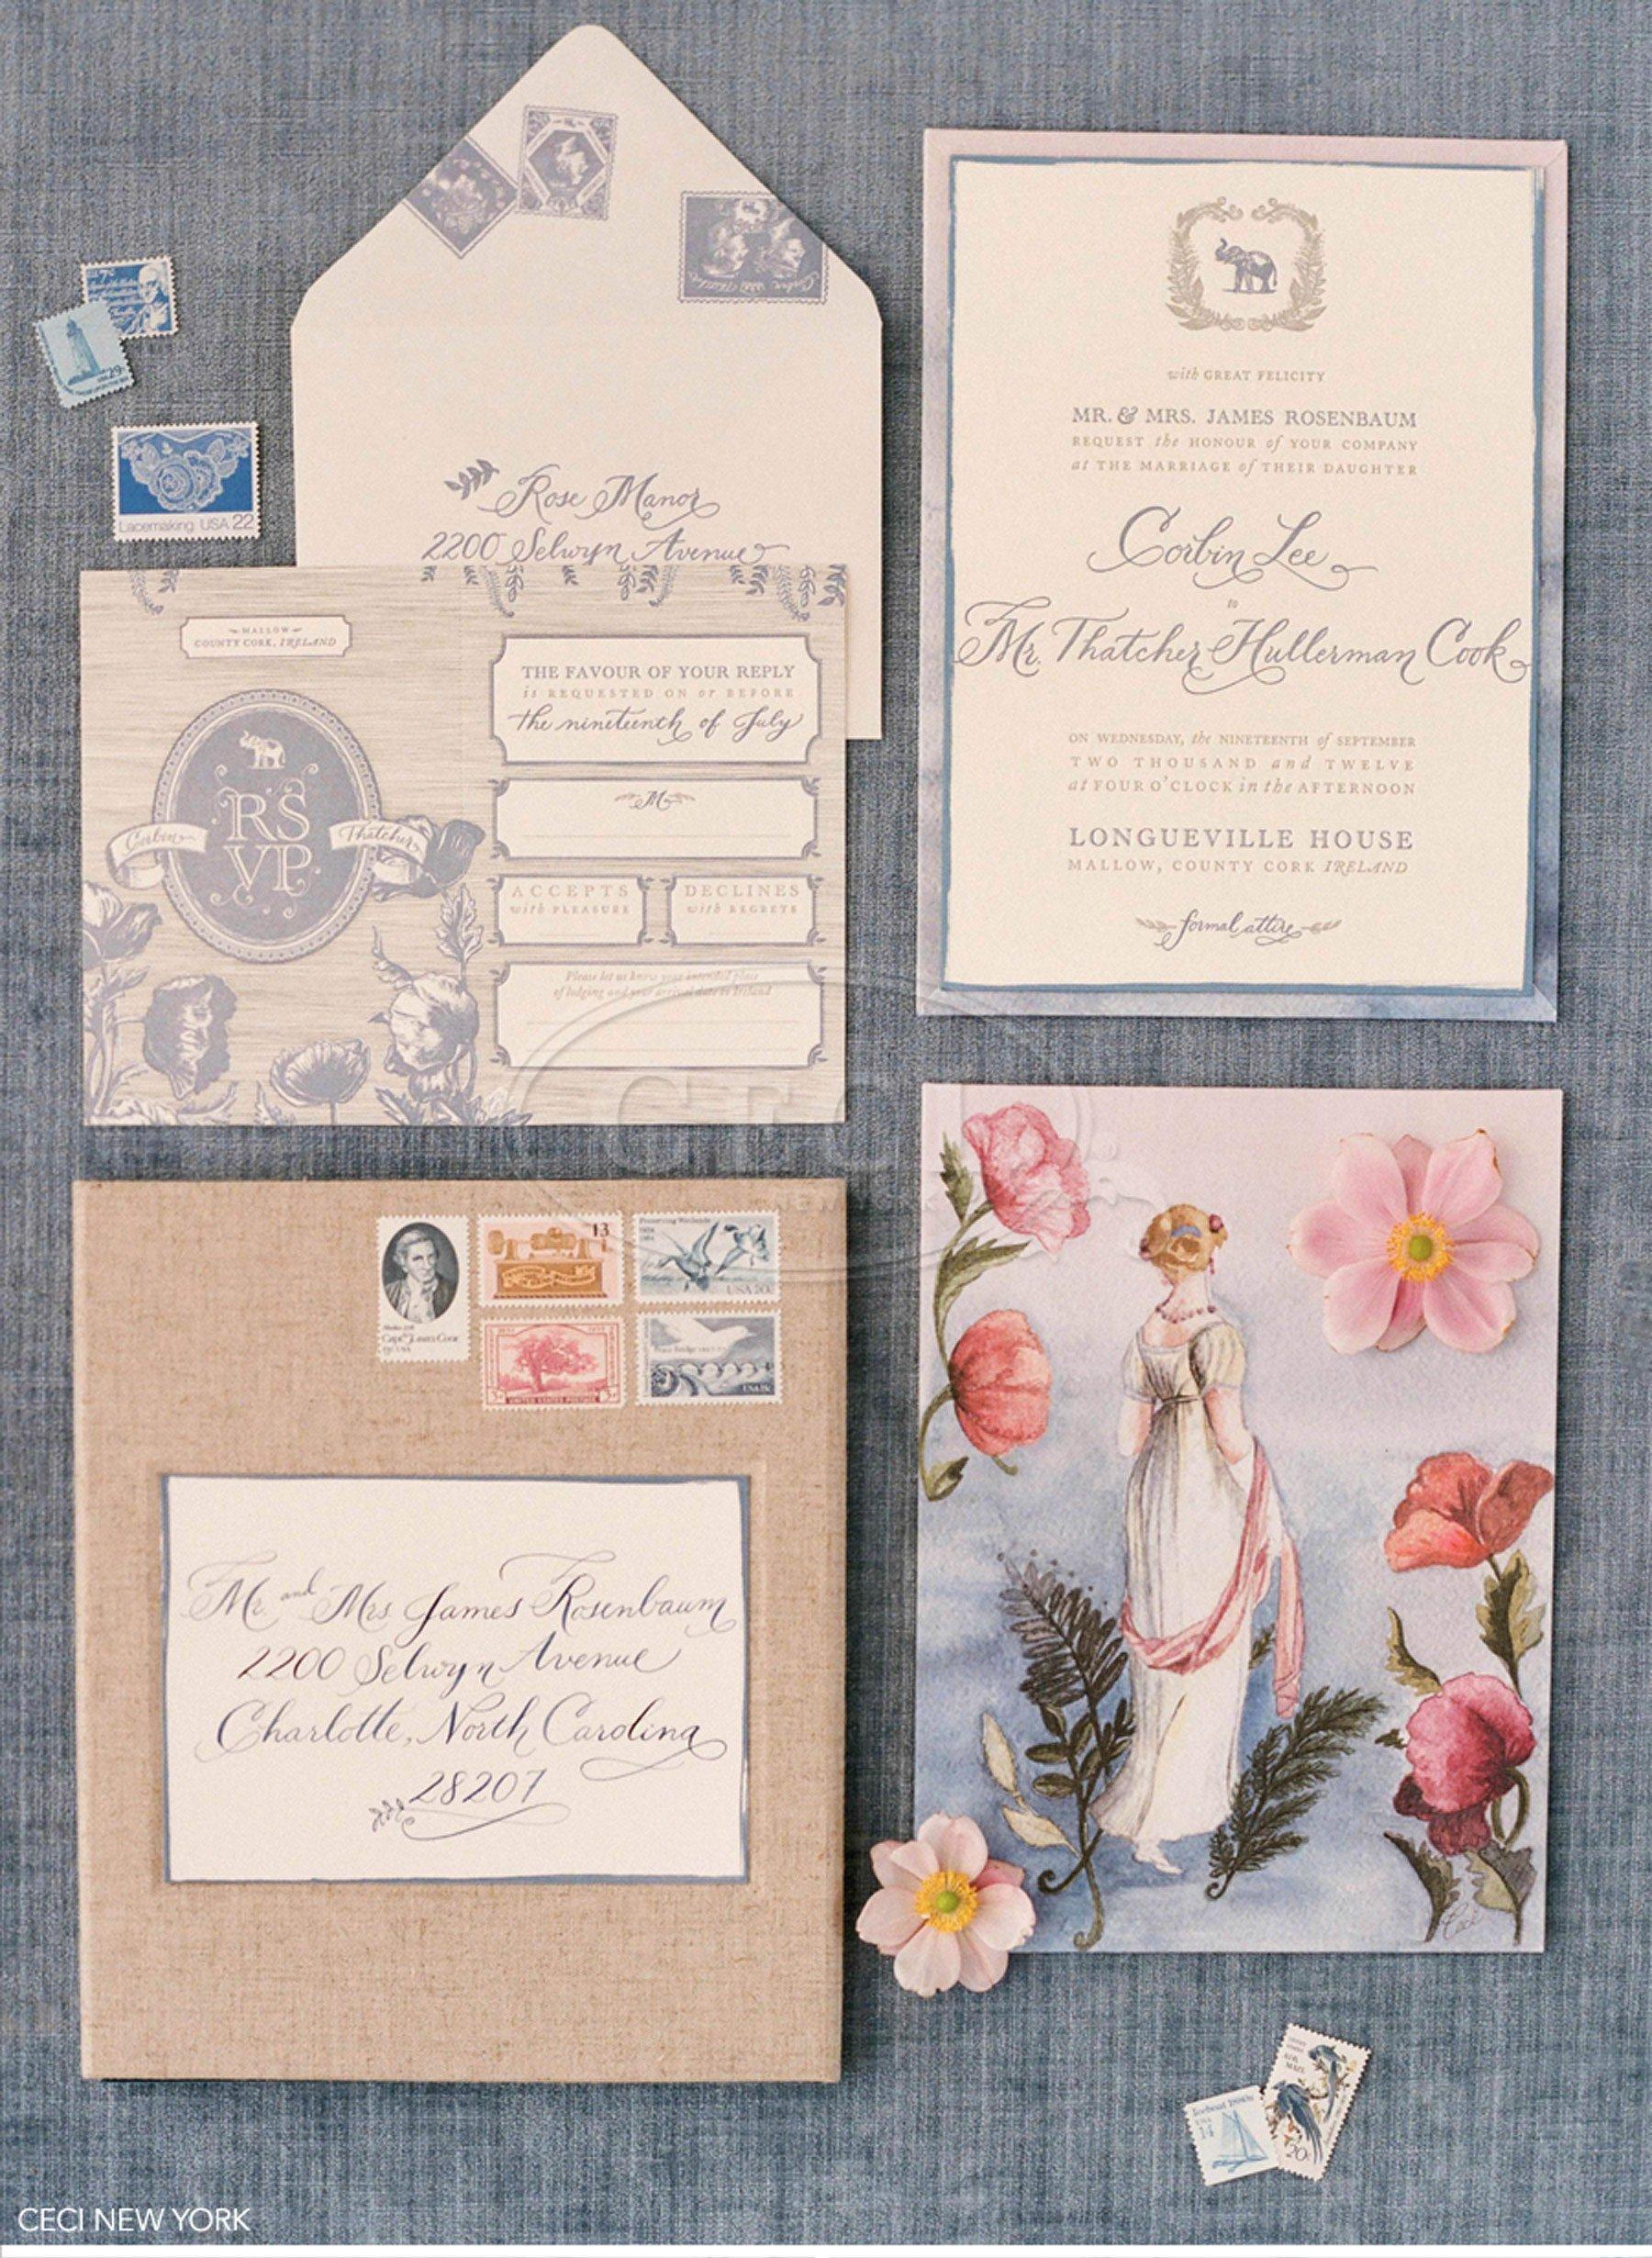 postcard style wedding invitations ireland 1800 x 2460 - Postcard Wedding Invitations